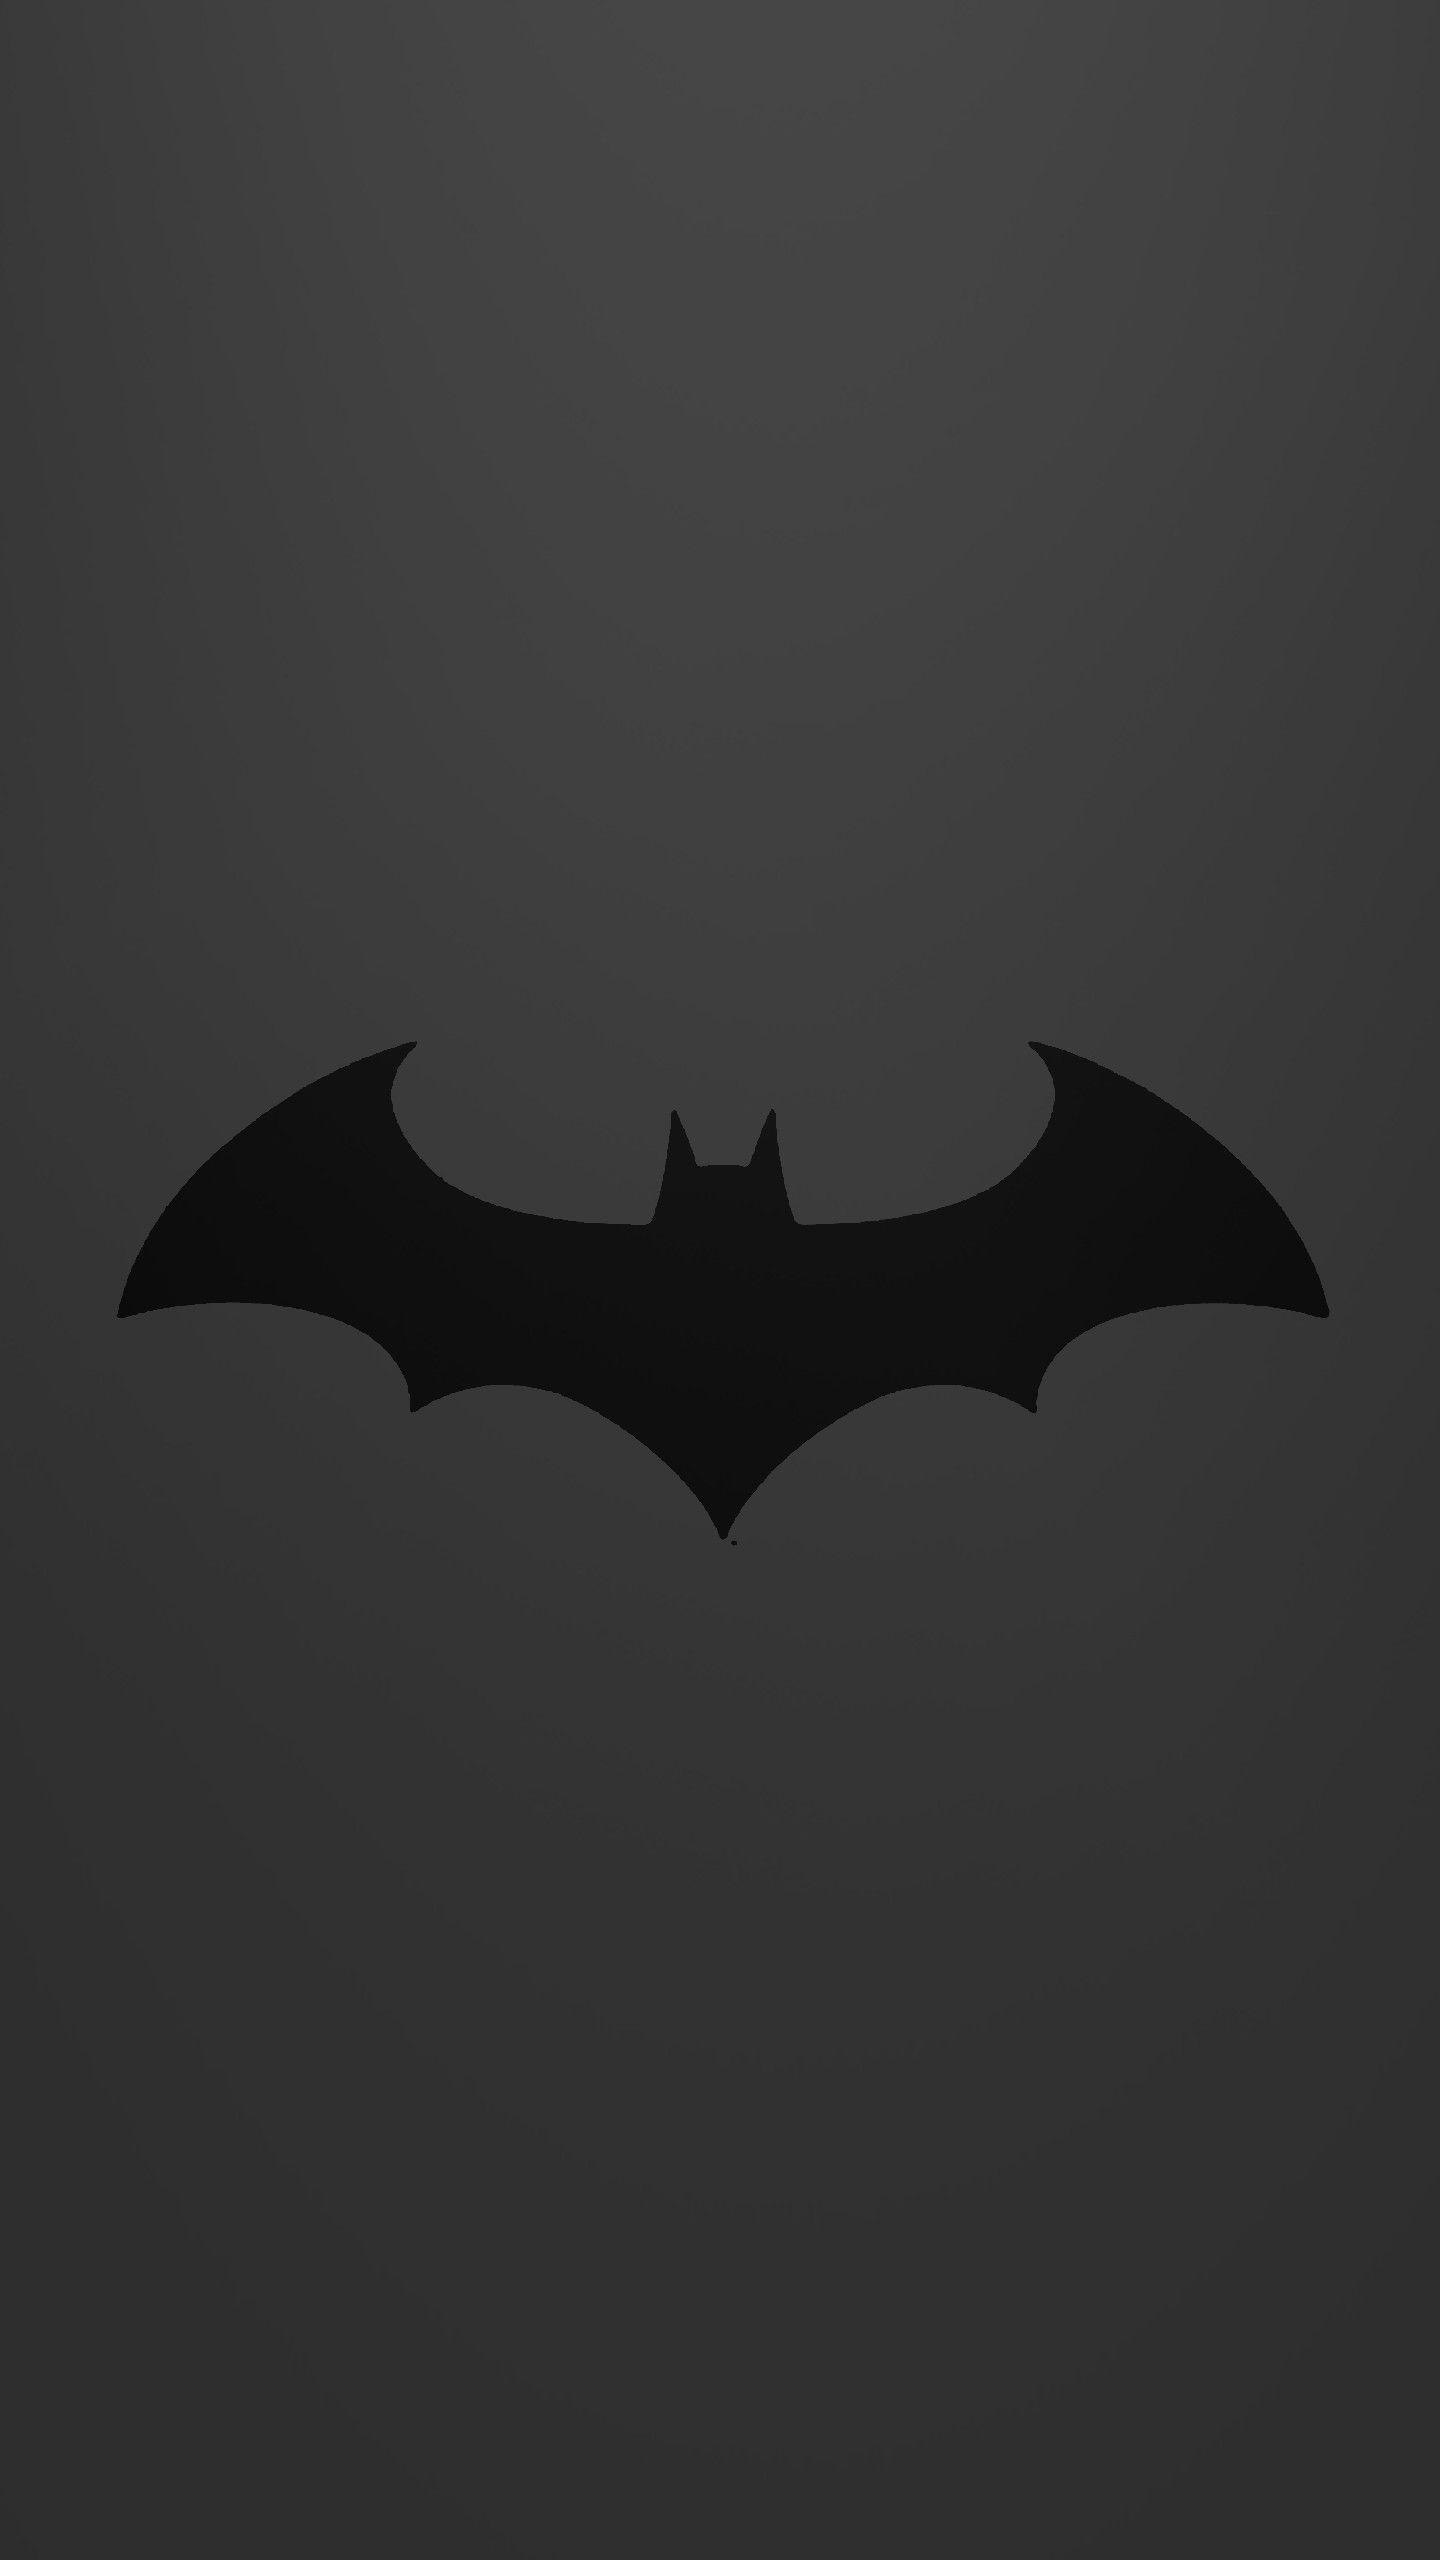 batman hd wallpaper phone